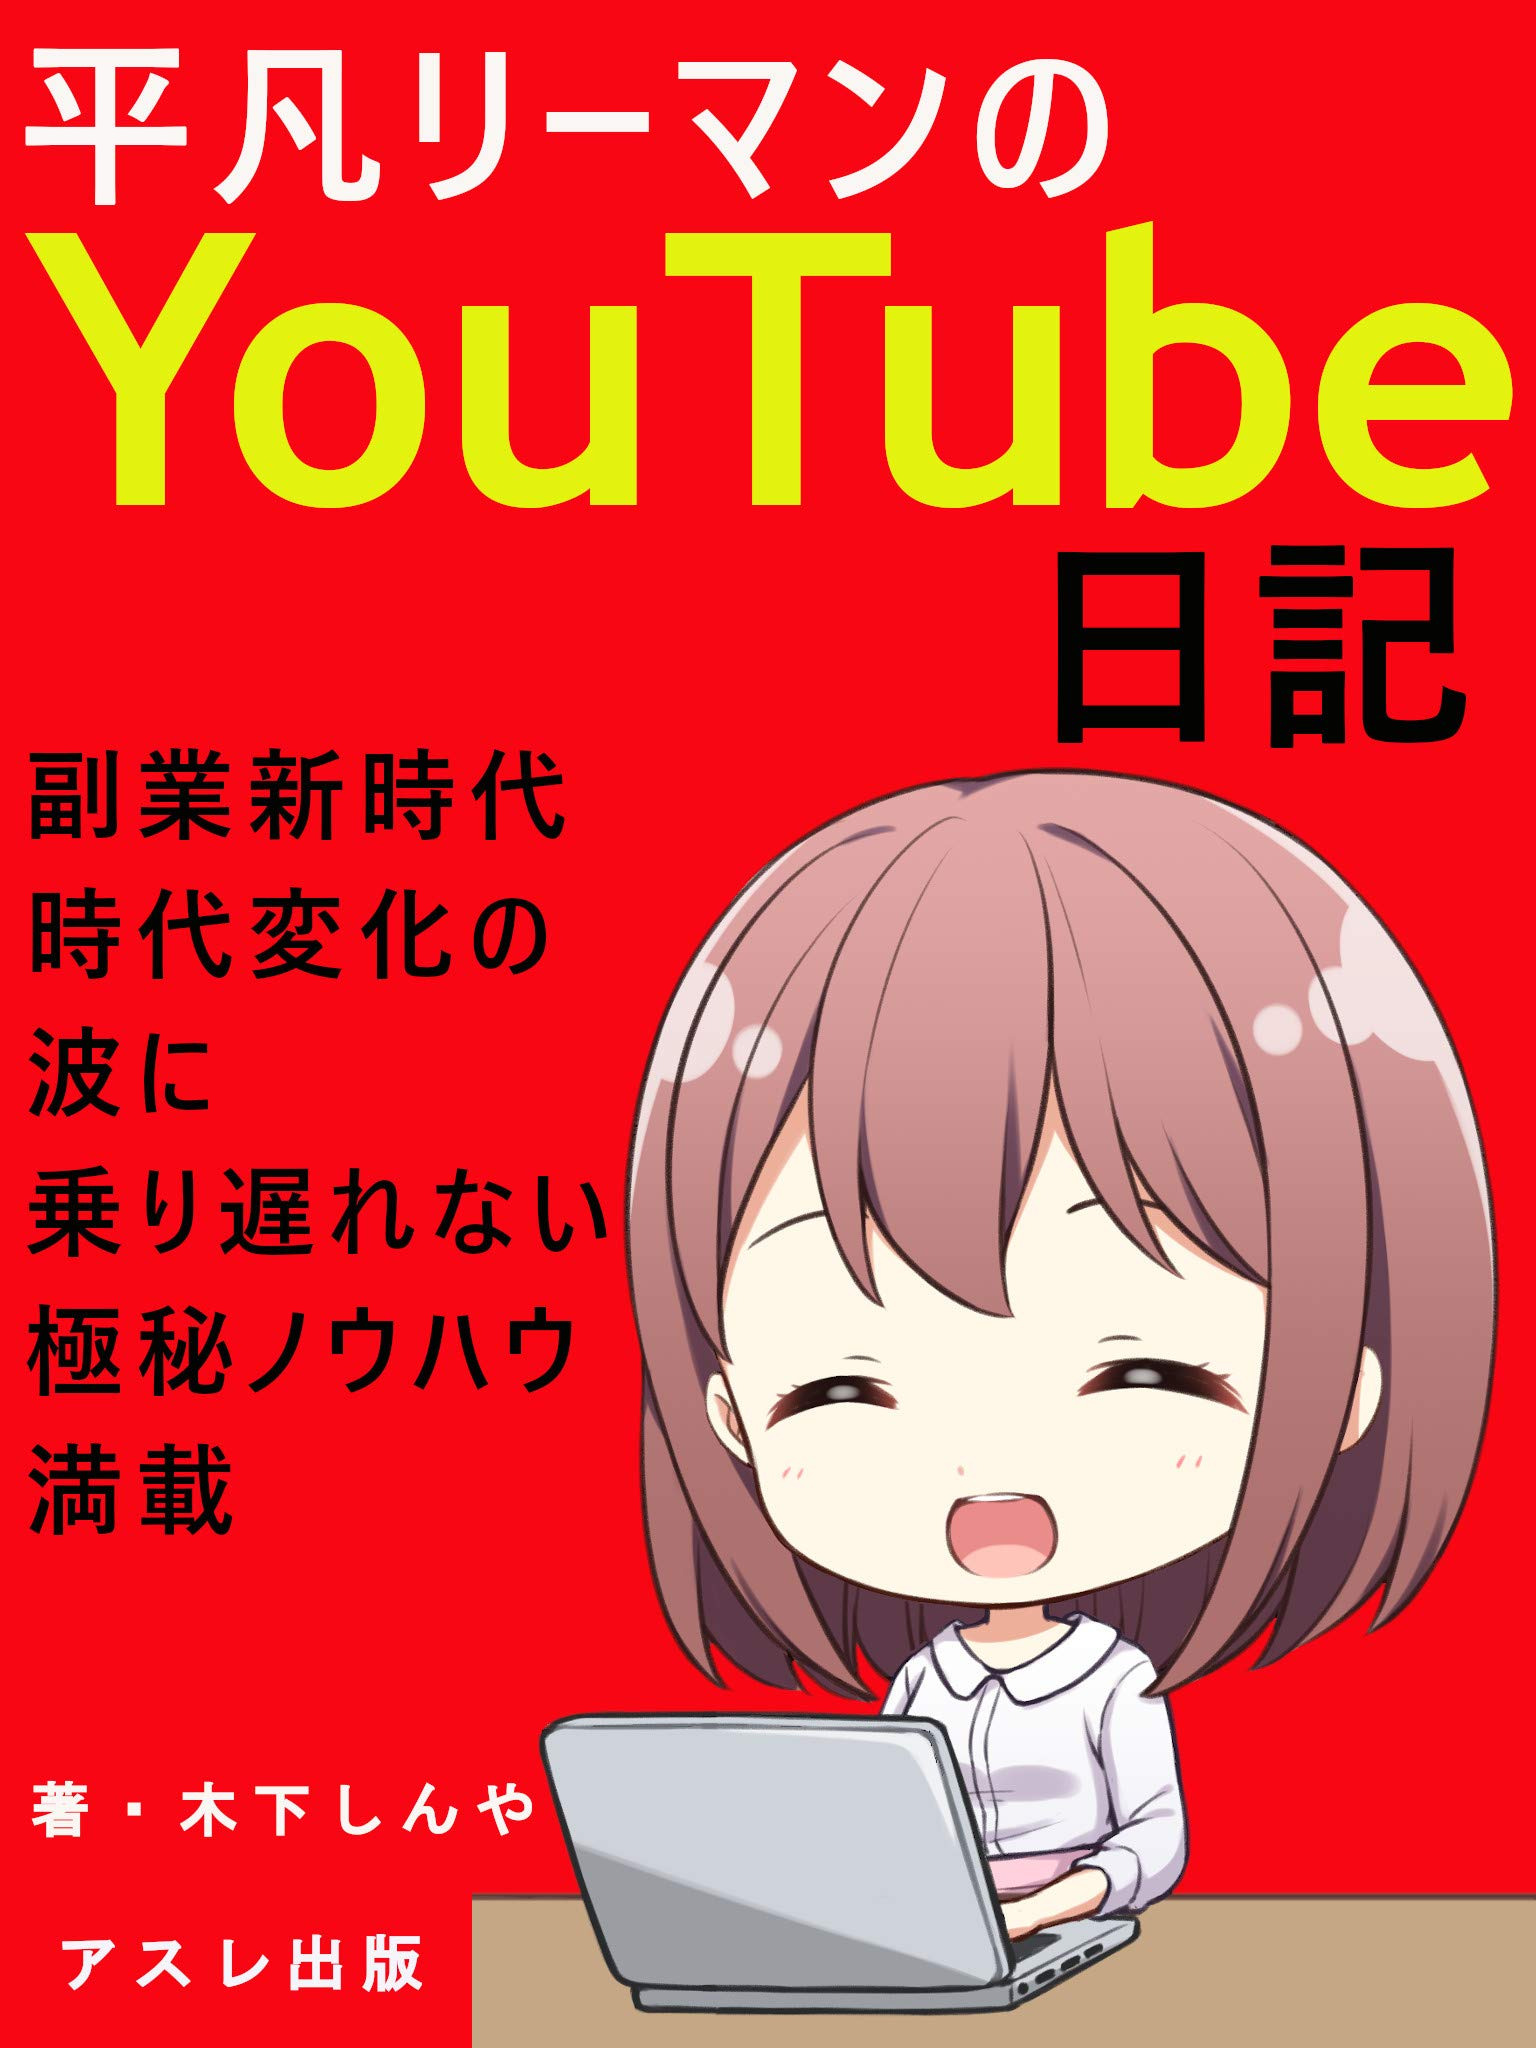 heibonriimannoyuutyuubunikki: fukugyoujidainonamininoriokurenai (Japanese Edition)